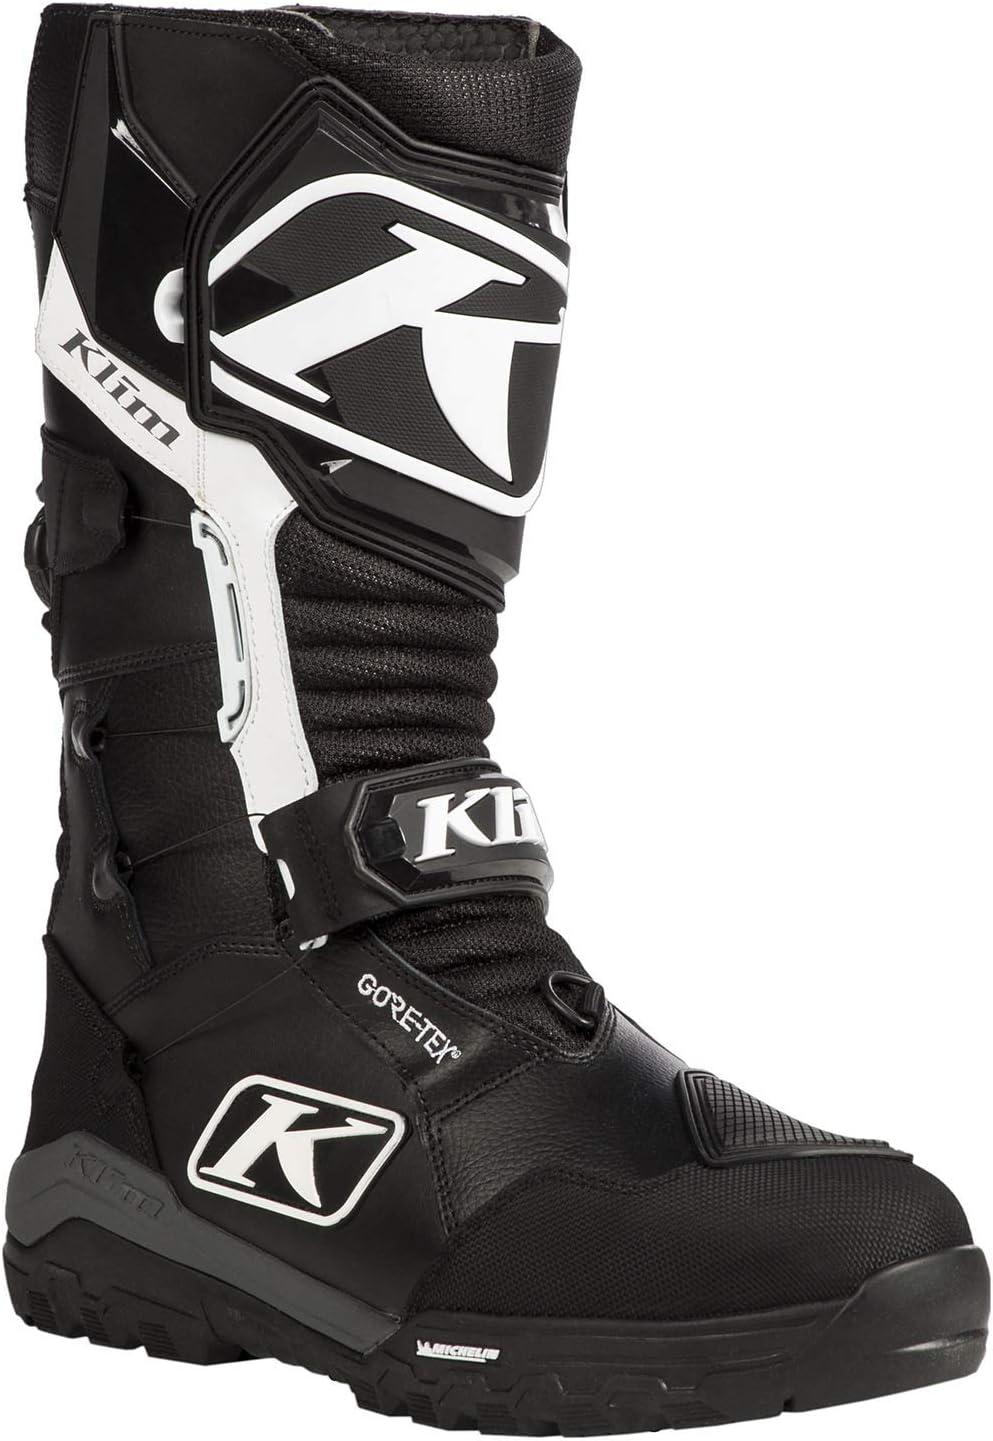 KLIM Havoc GTX BOA Winter Black Men's Challenge San Antonio Mall the lowest price of Japan ☆ Boots Snowmobile 9